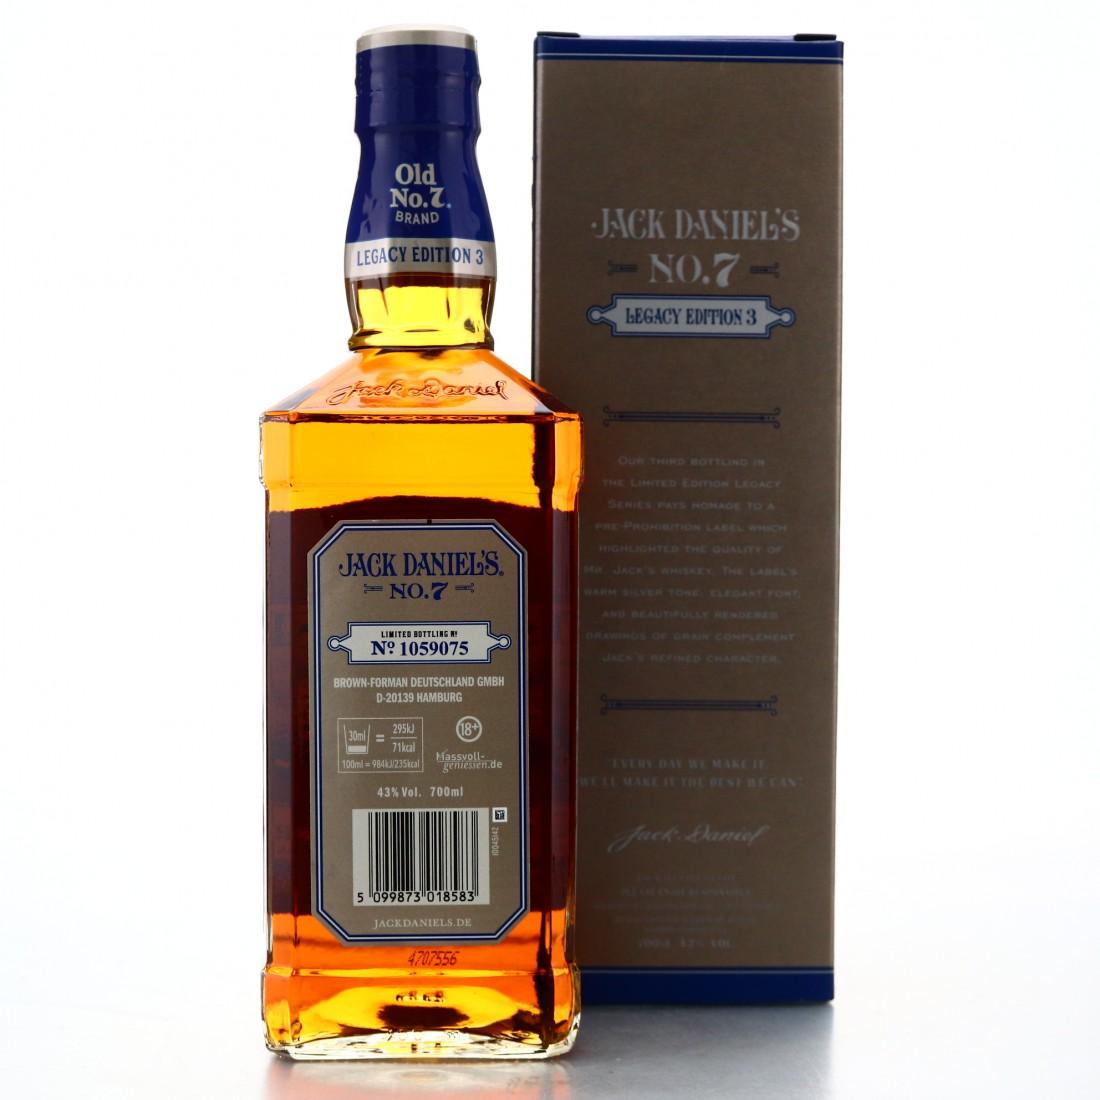 Jack Daniel's Old No.7 Legacy Edition 3